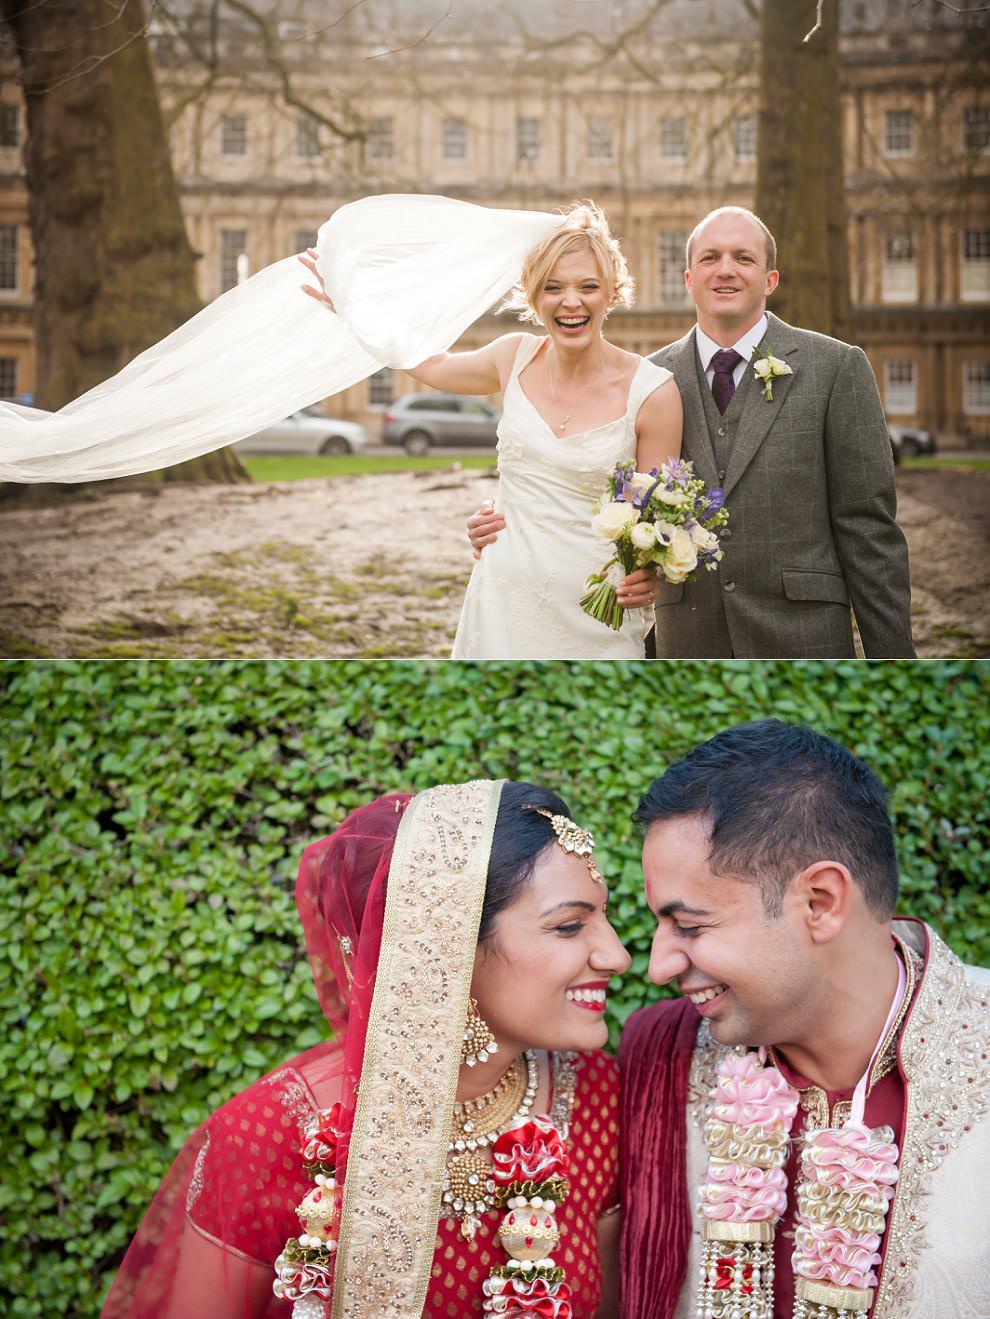 Best-wedding-photos-UK-2015-094